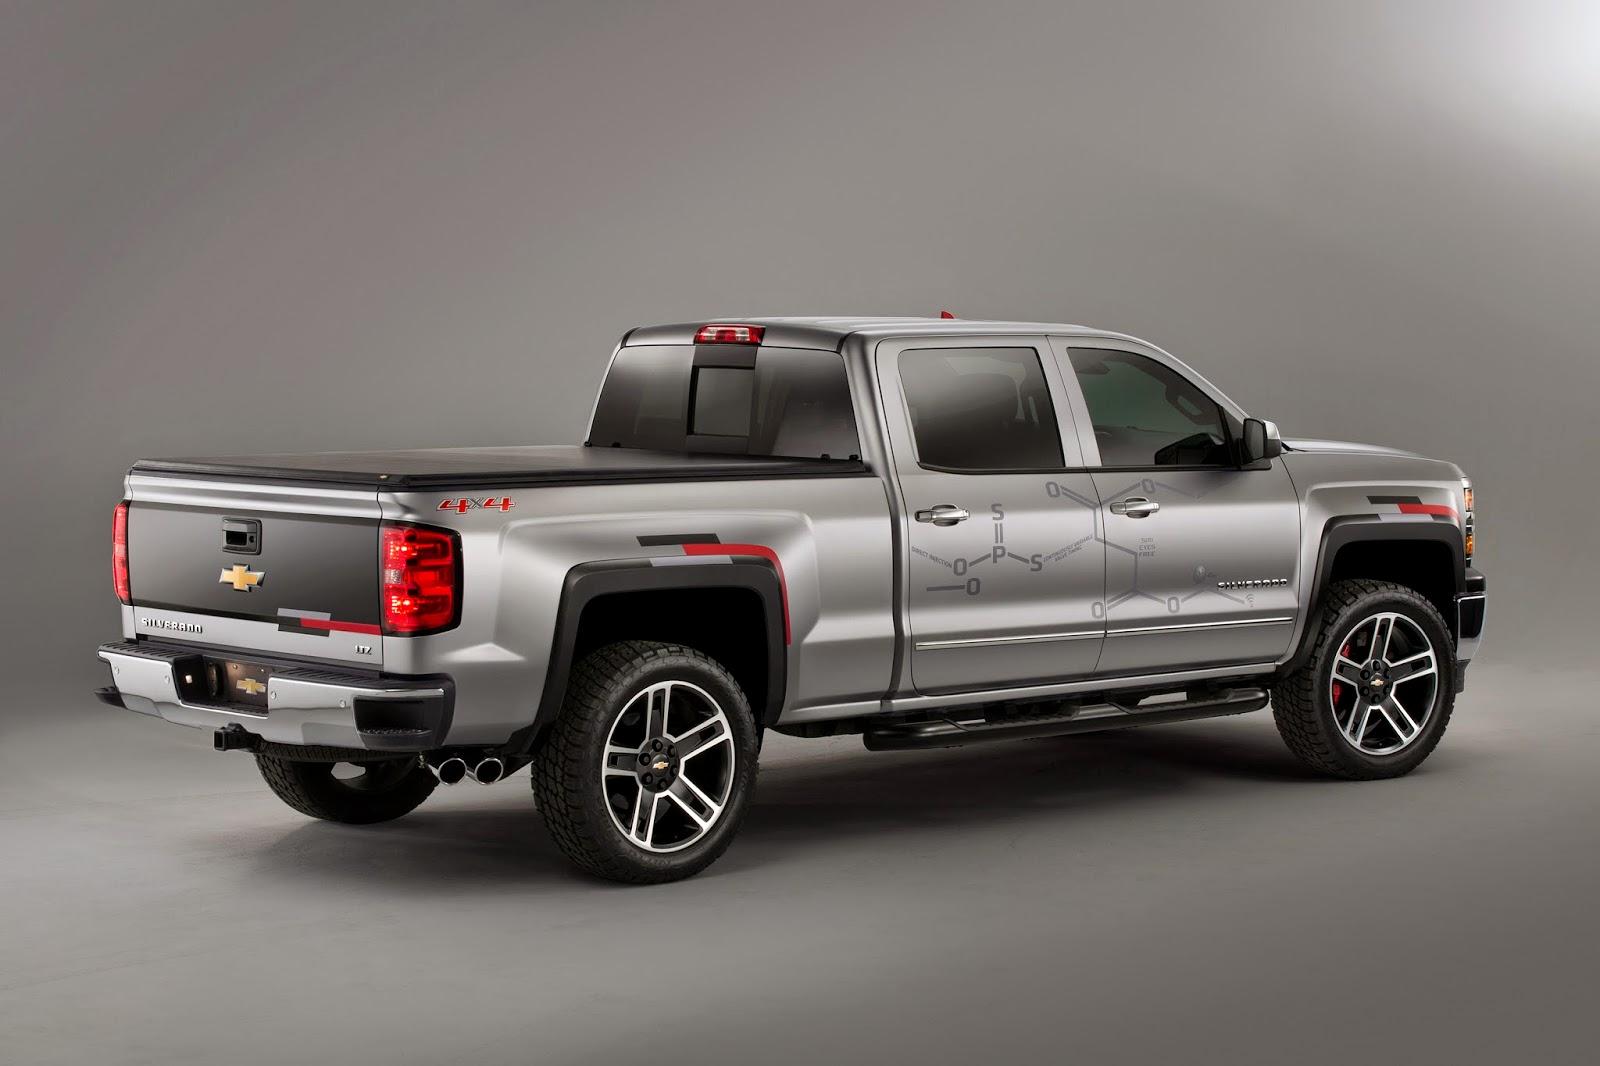 Truck chevy concept truck : Richard Chevy - Straight to the News: 2015 Chevrolet Silverado ...